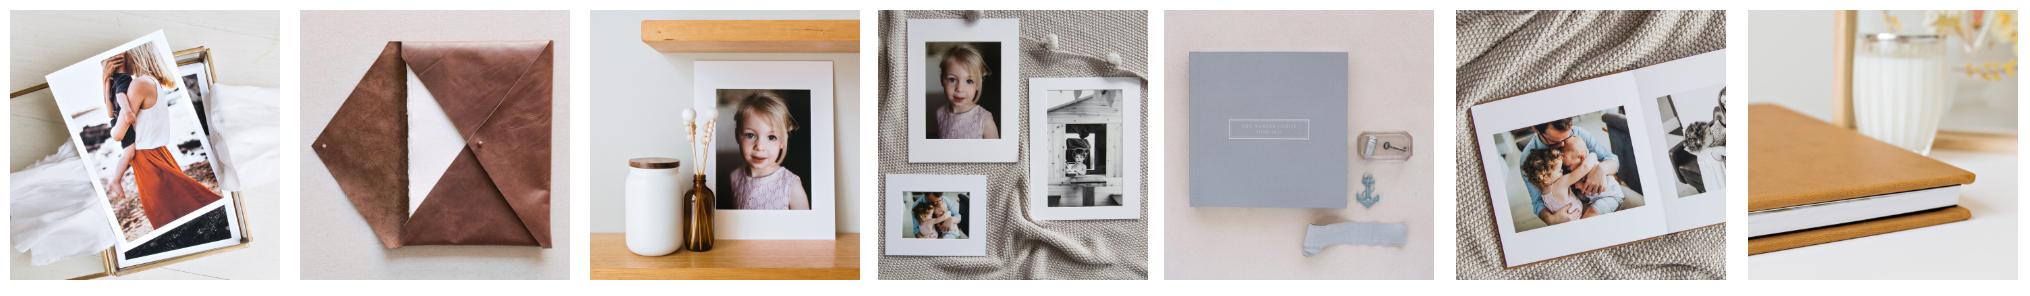 Carrie Jones Photography Prints Frames Albums